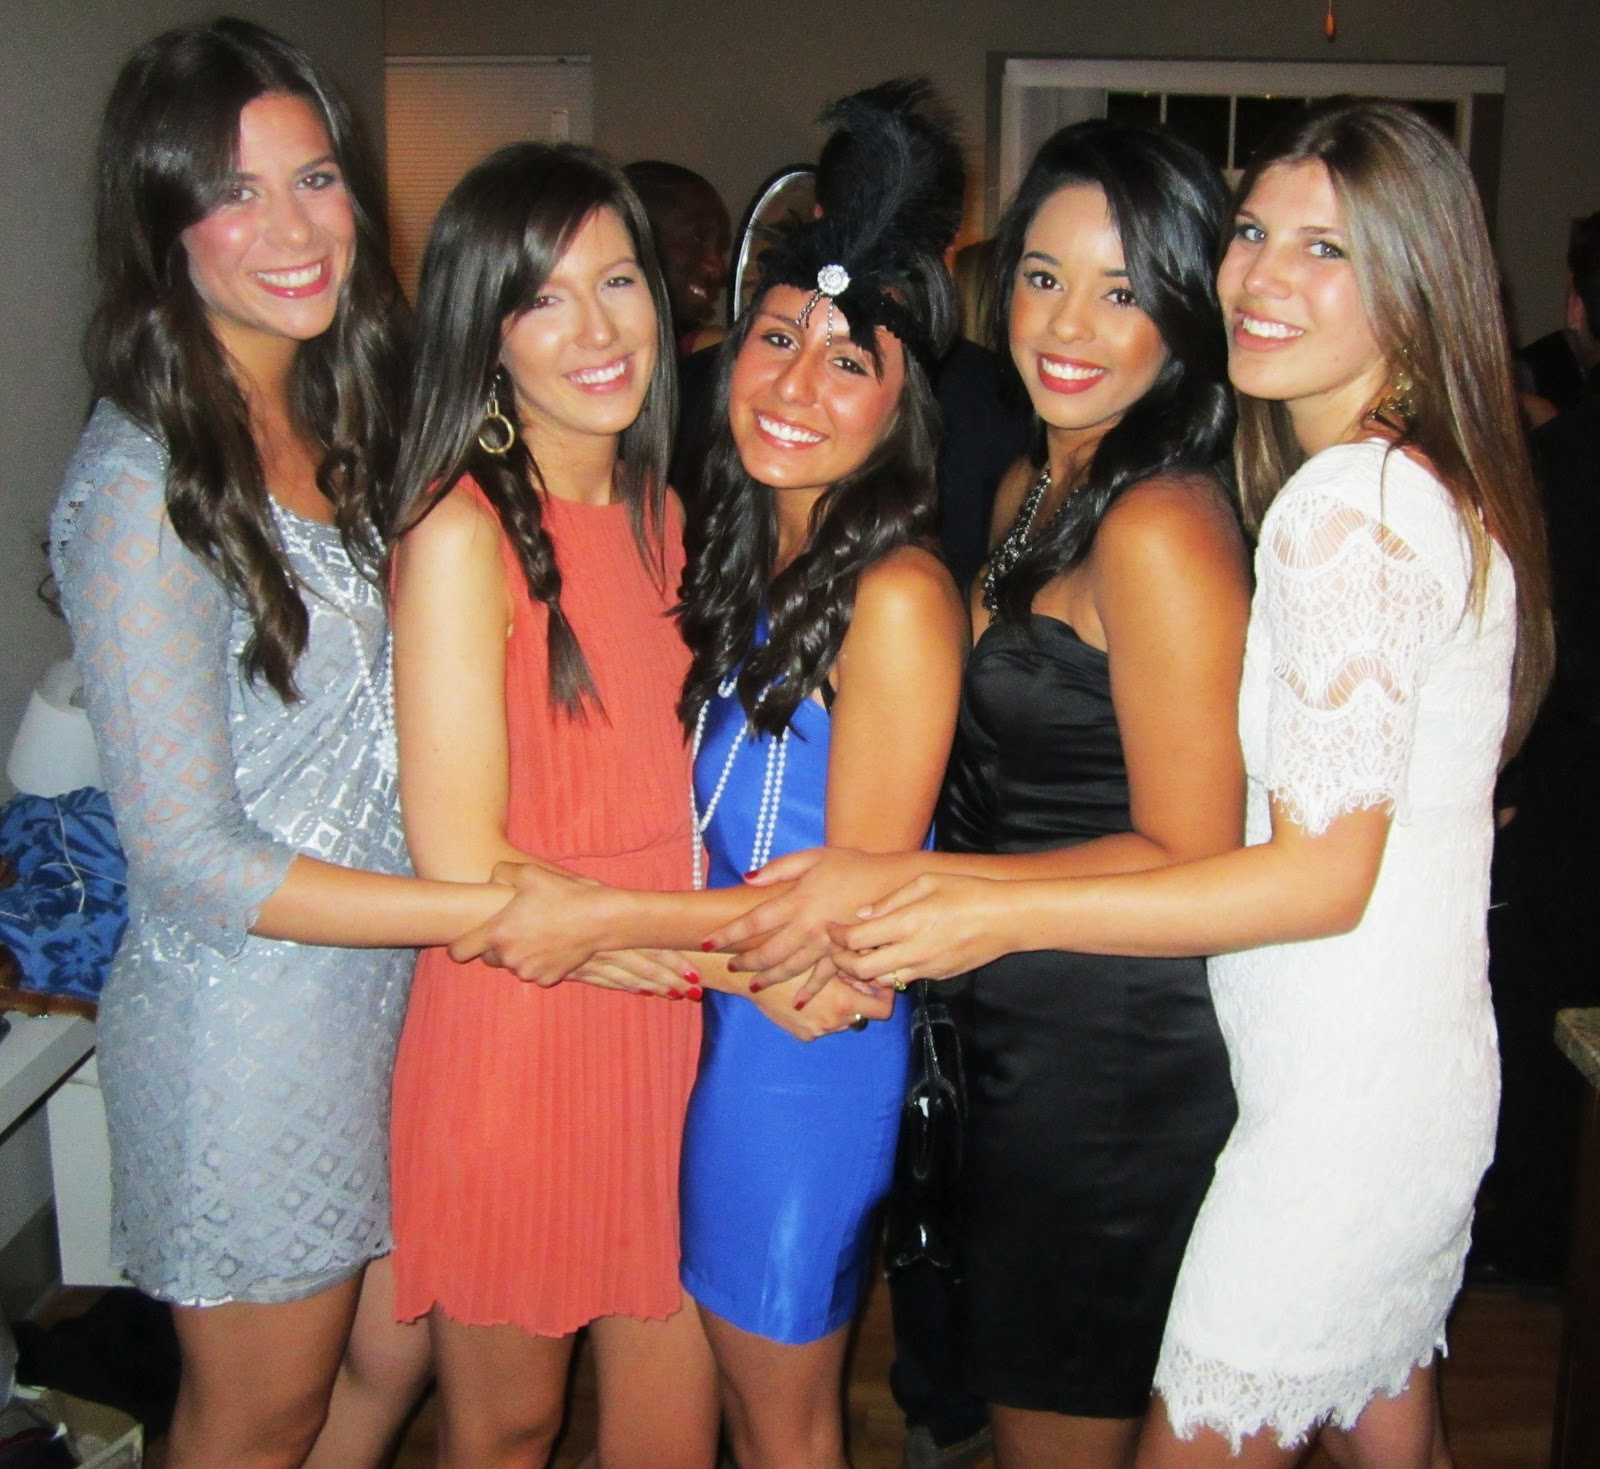 Bachelor party omega